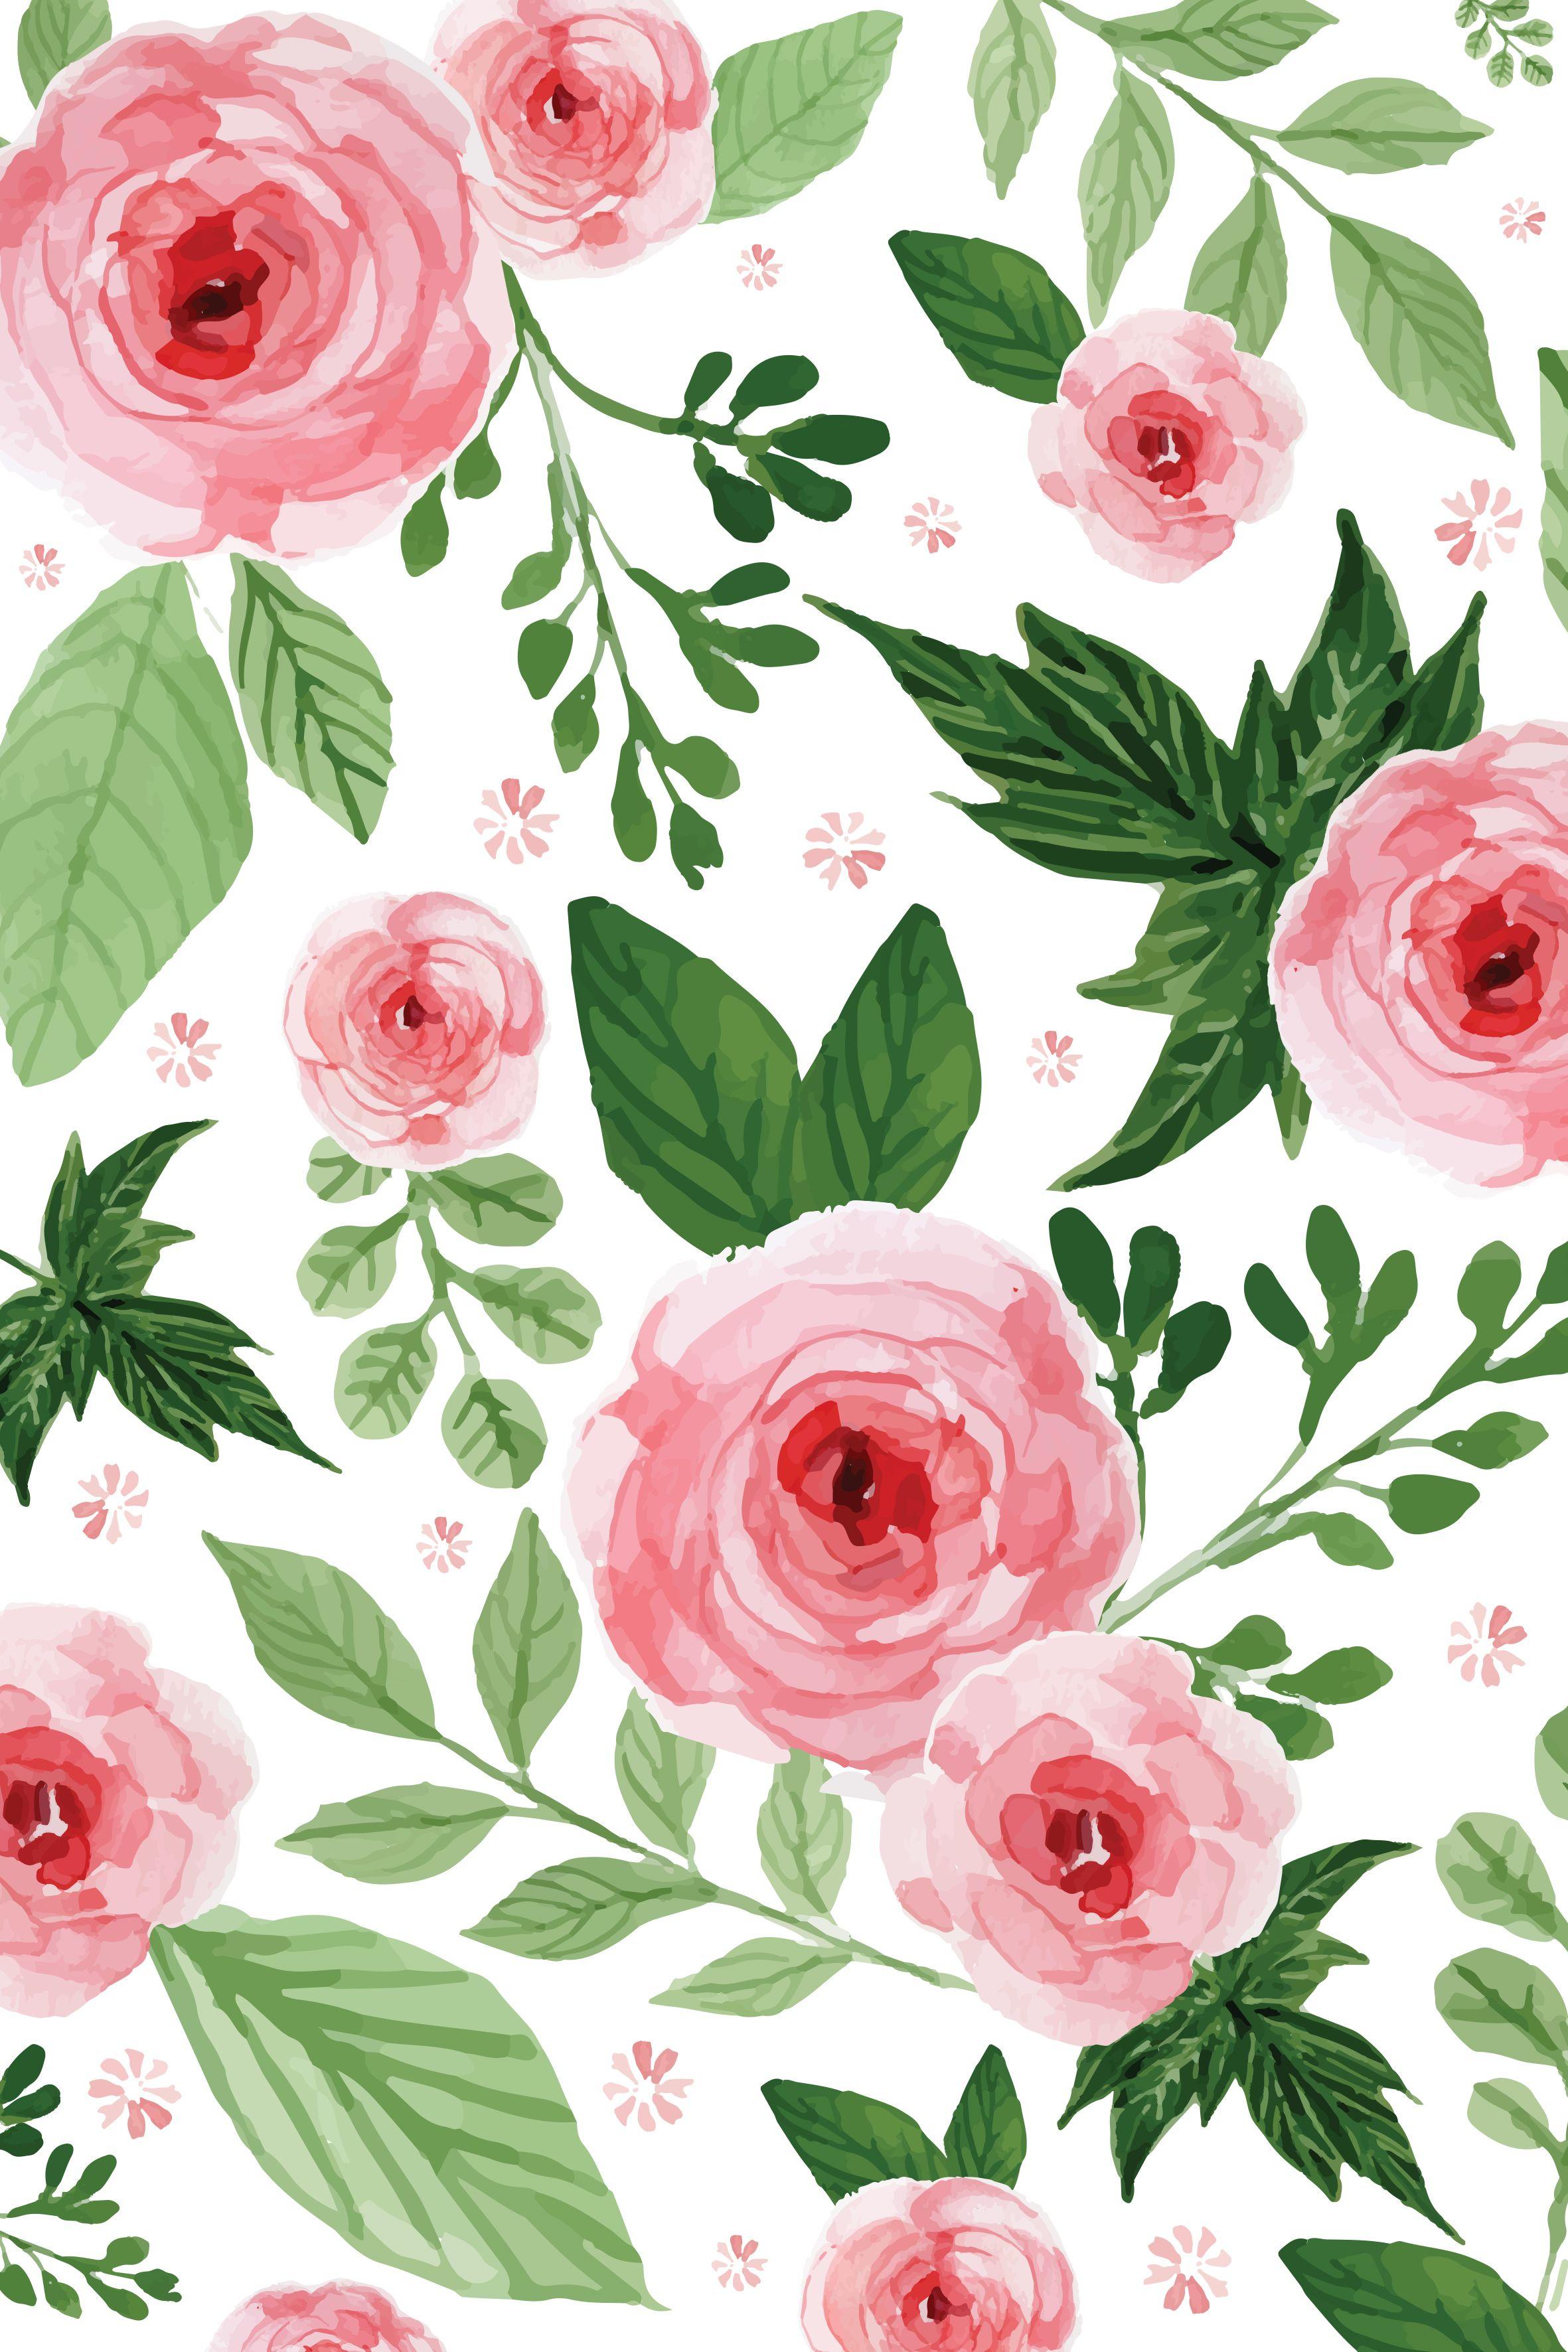 Flowers Flower background wallpaper, Flower drawing